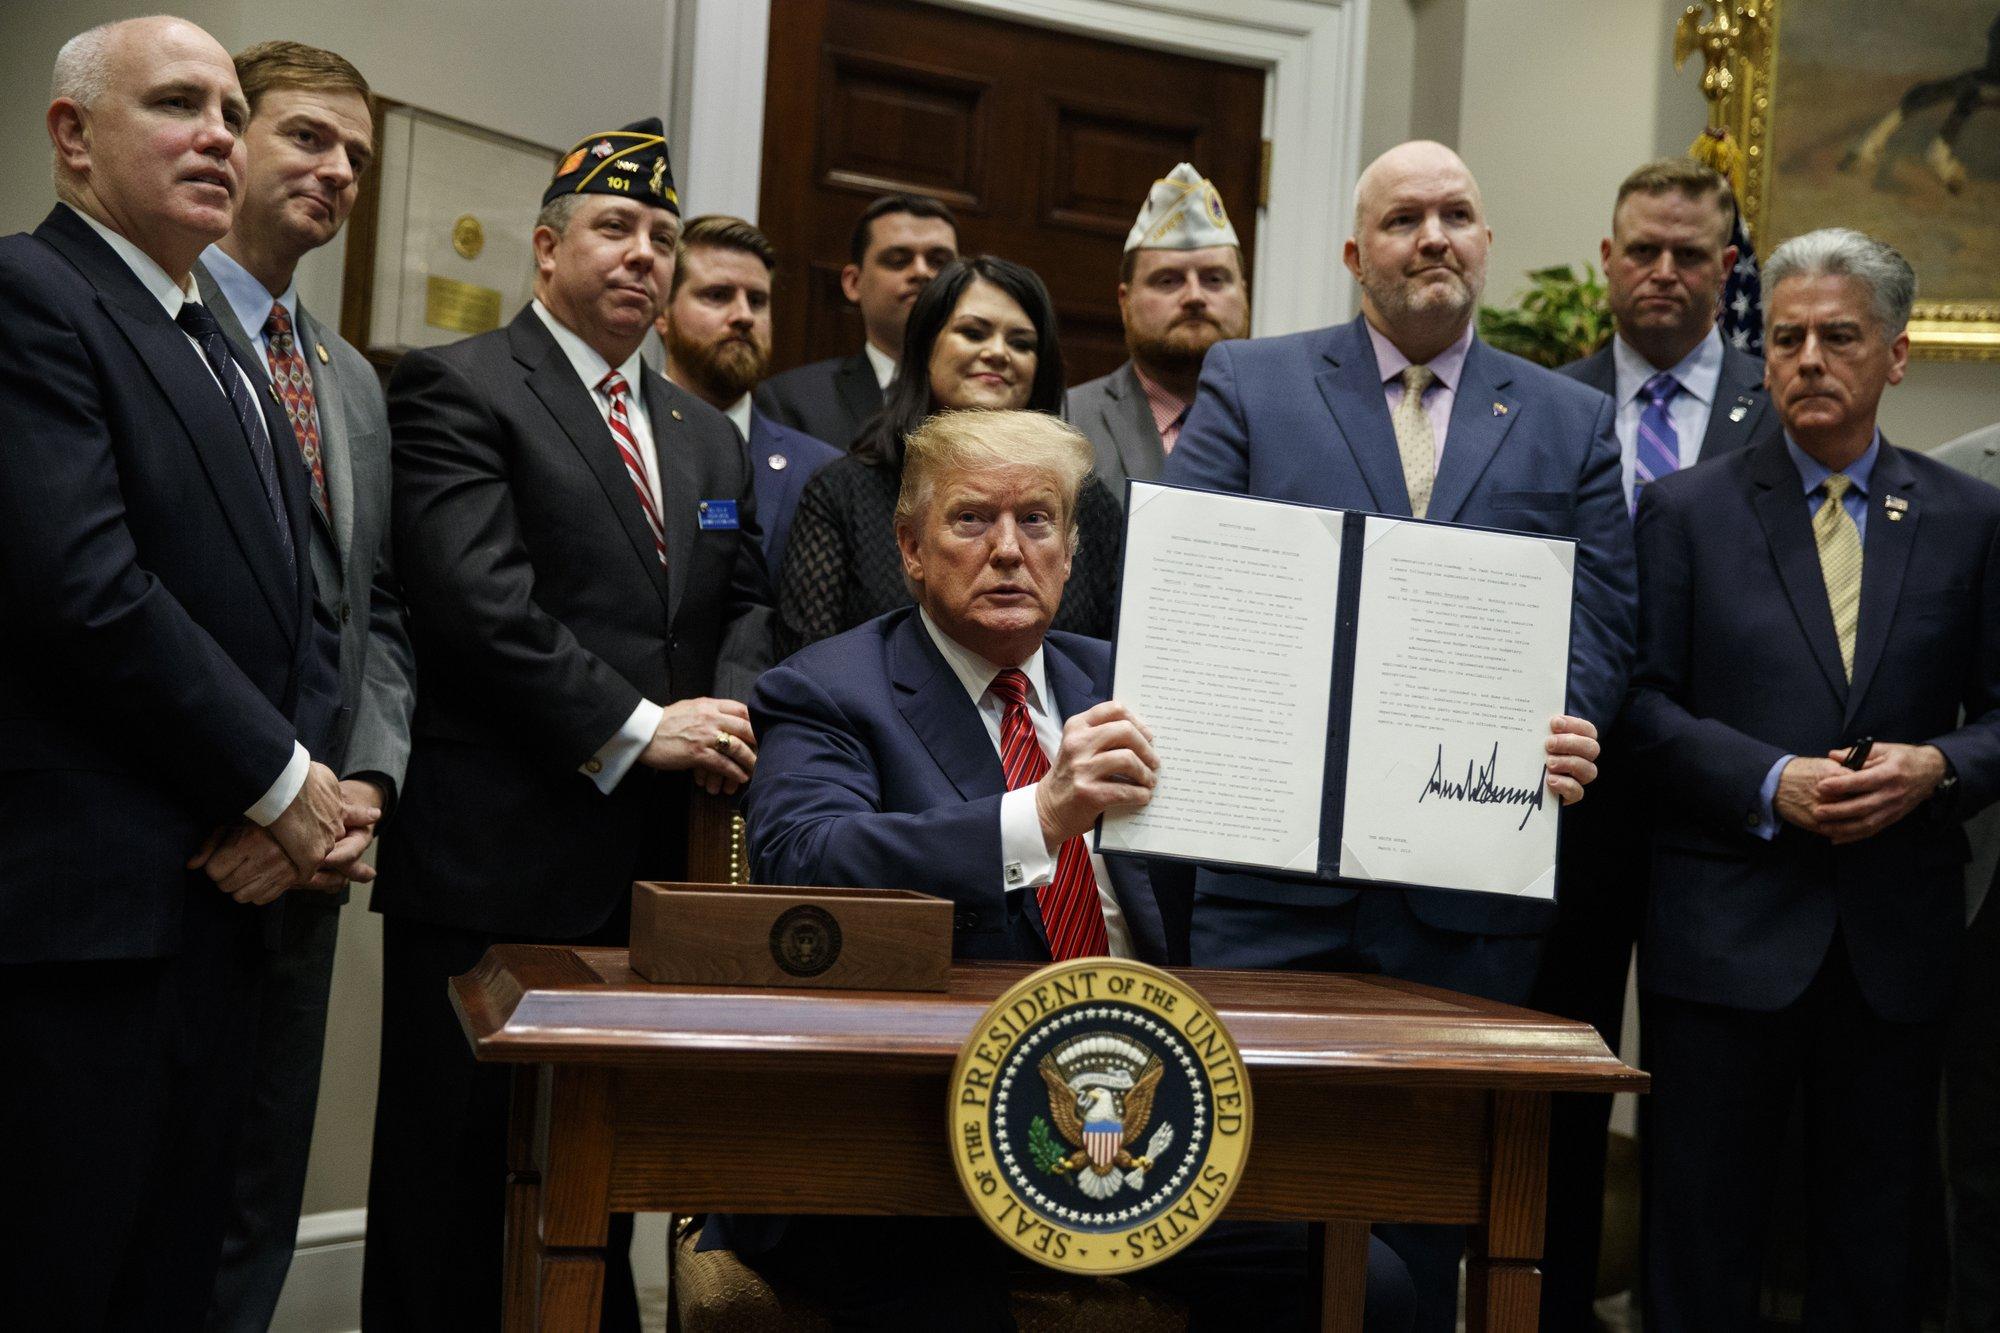 Trump Signs Executive Order to Address Veteran Suicide